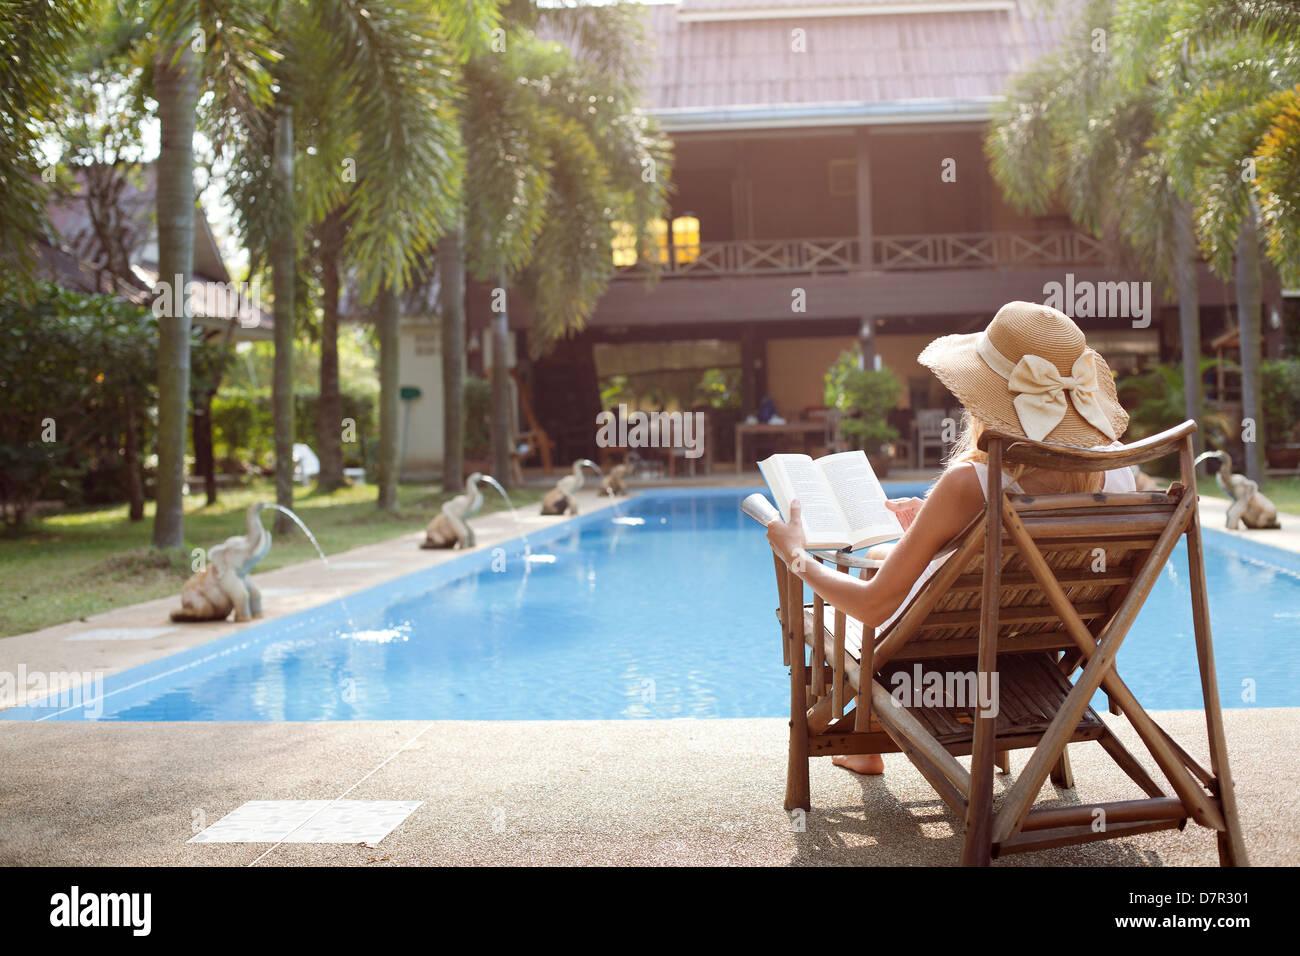 Resort Hotel Pool Hammock Stock Photos Amp Resort Hotel Pool